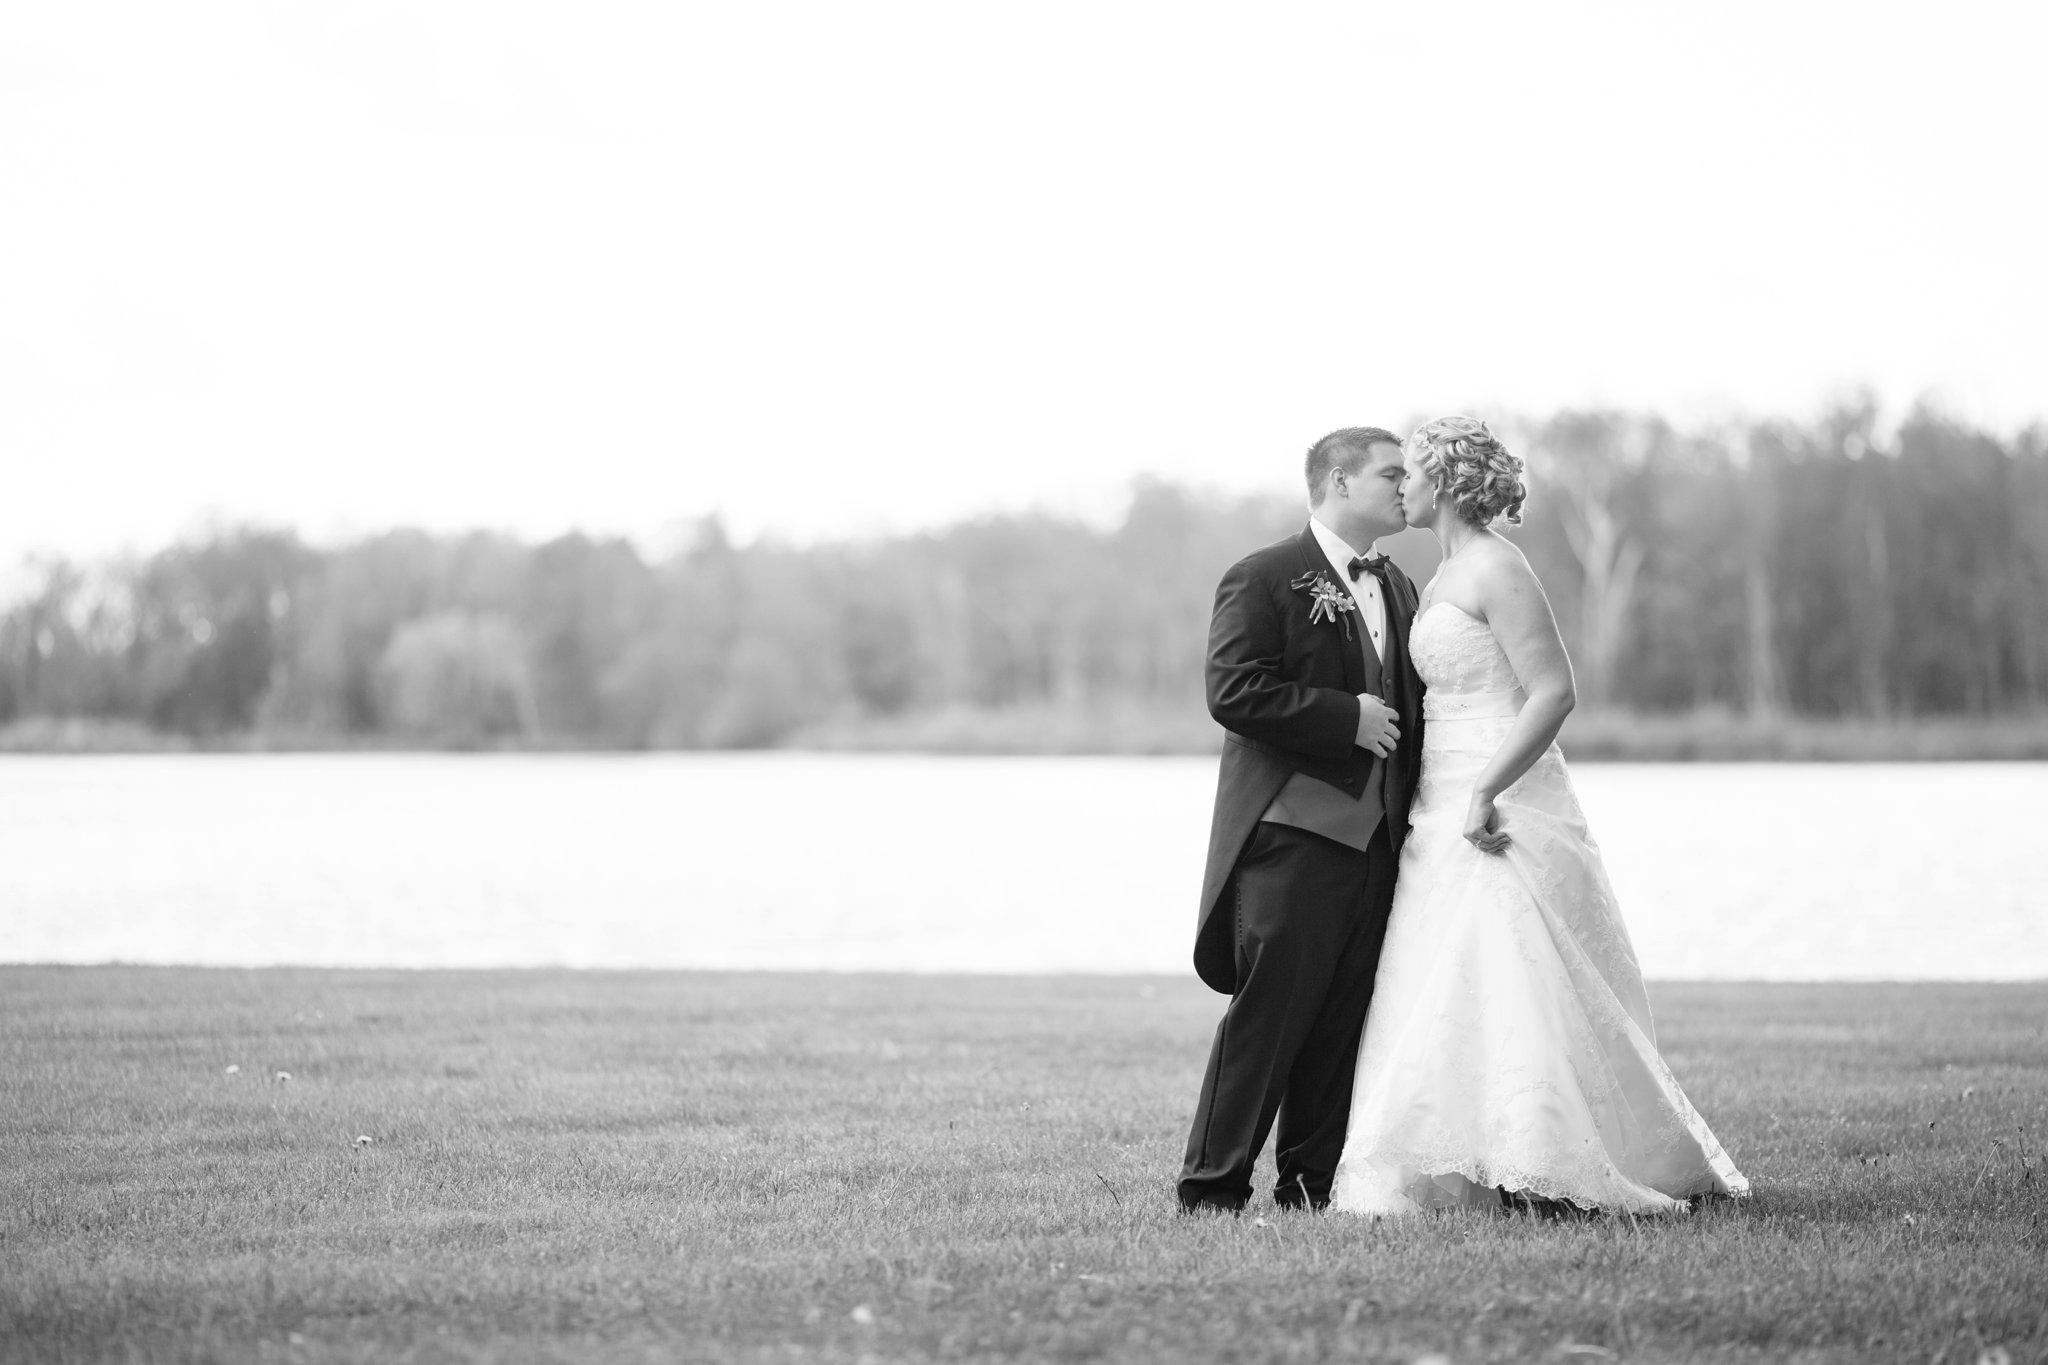 montdale_country_club_wedding_photos_photographer_scranton_pa7151.jpg